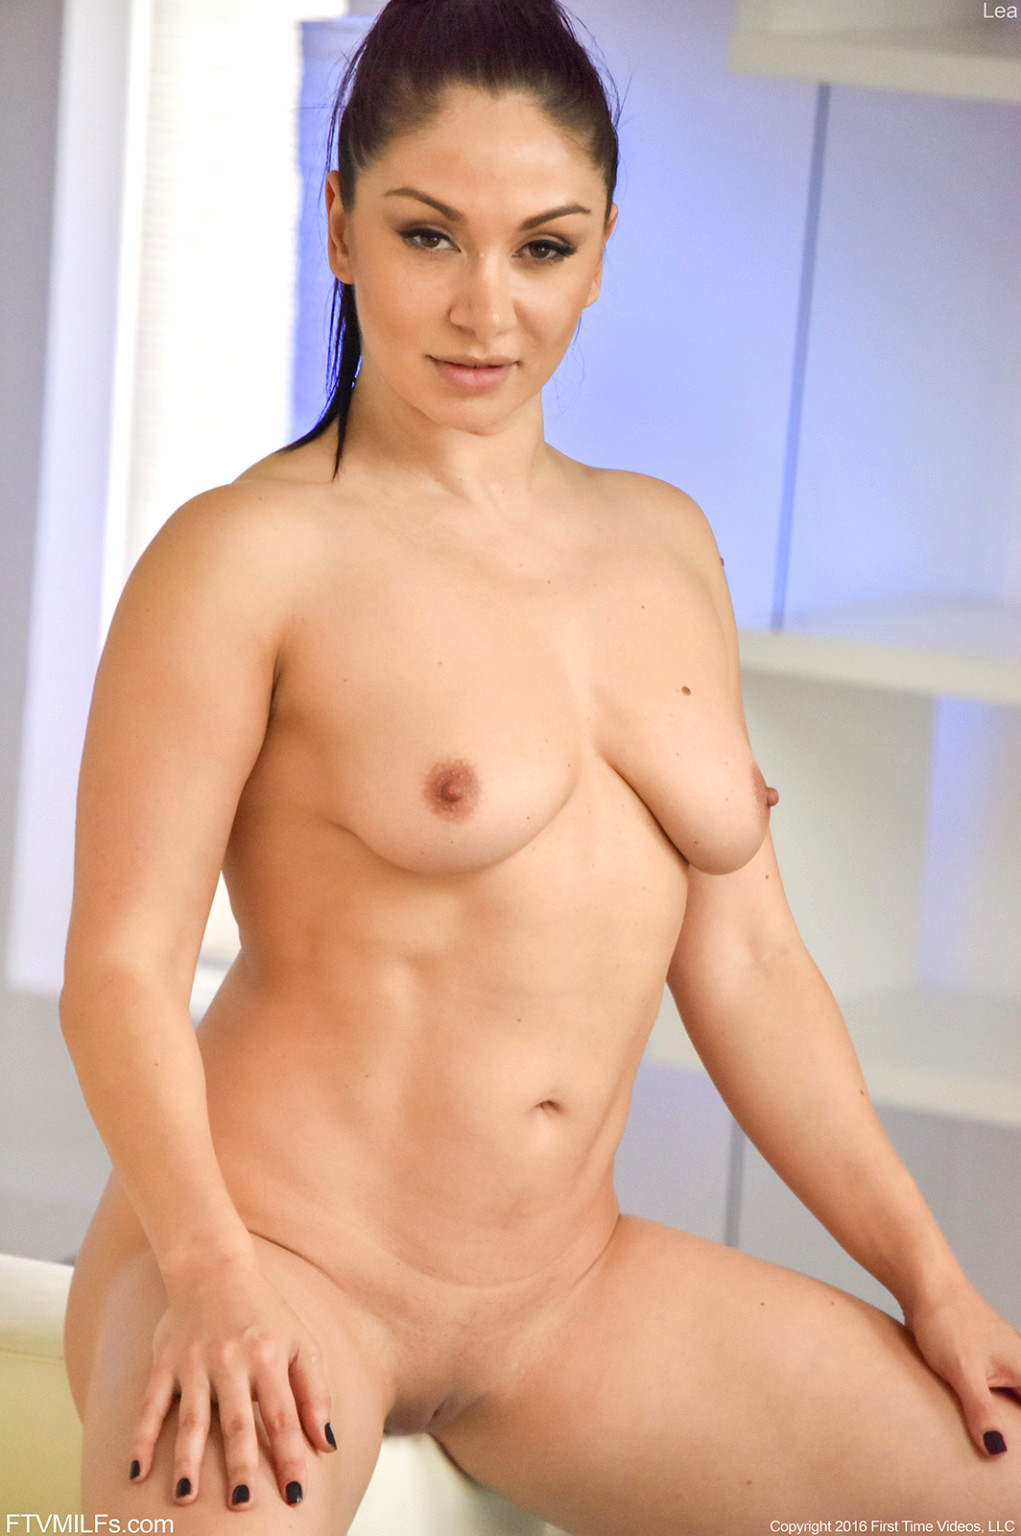 Lea Xxx